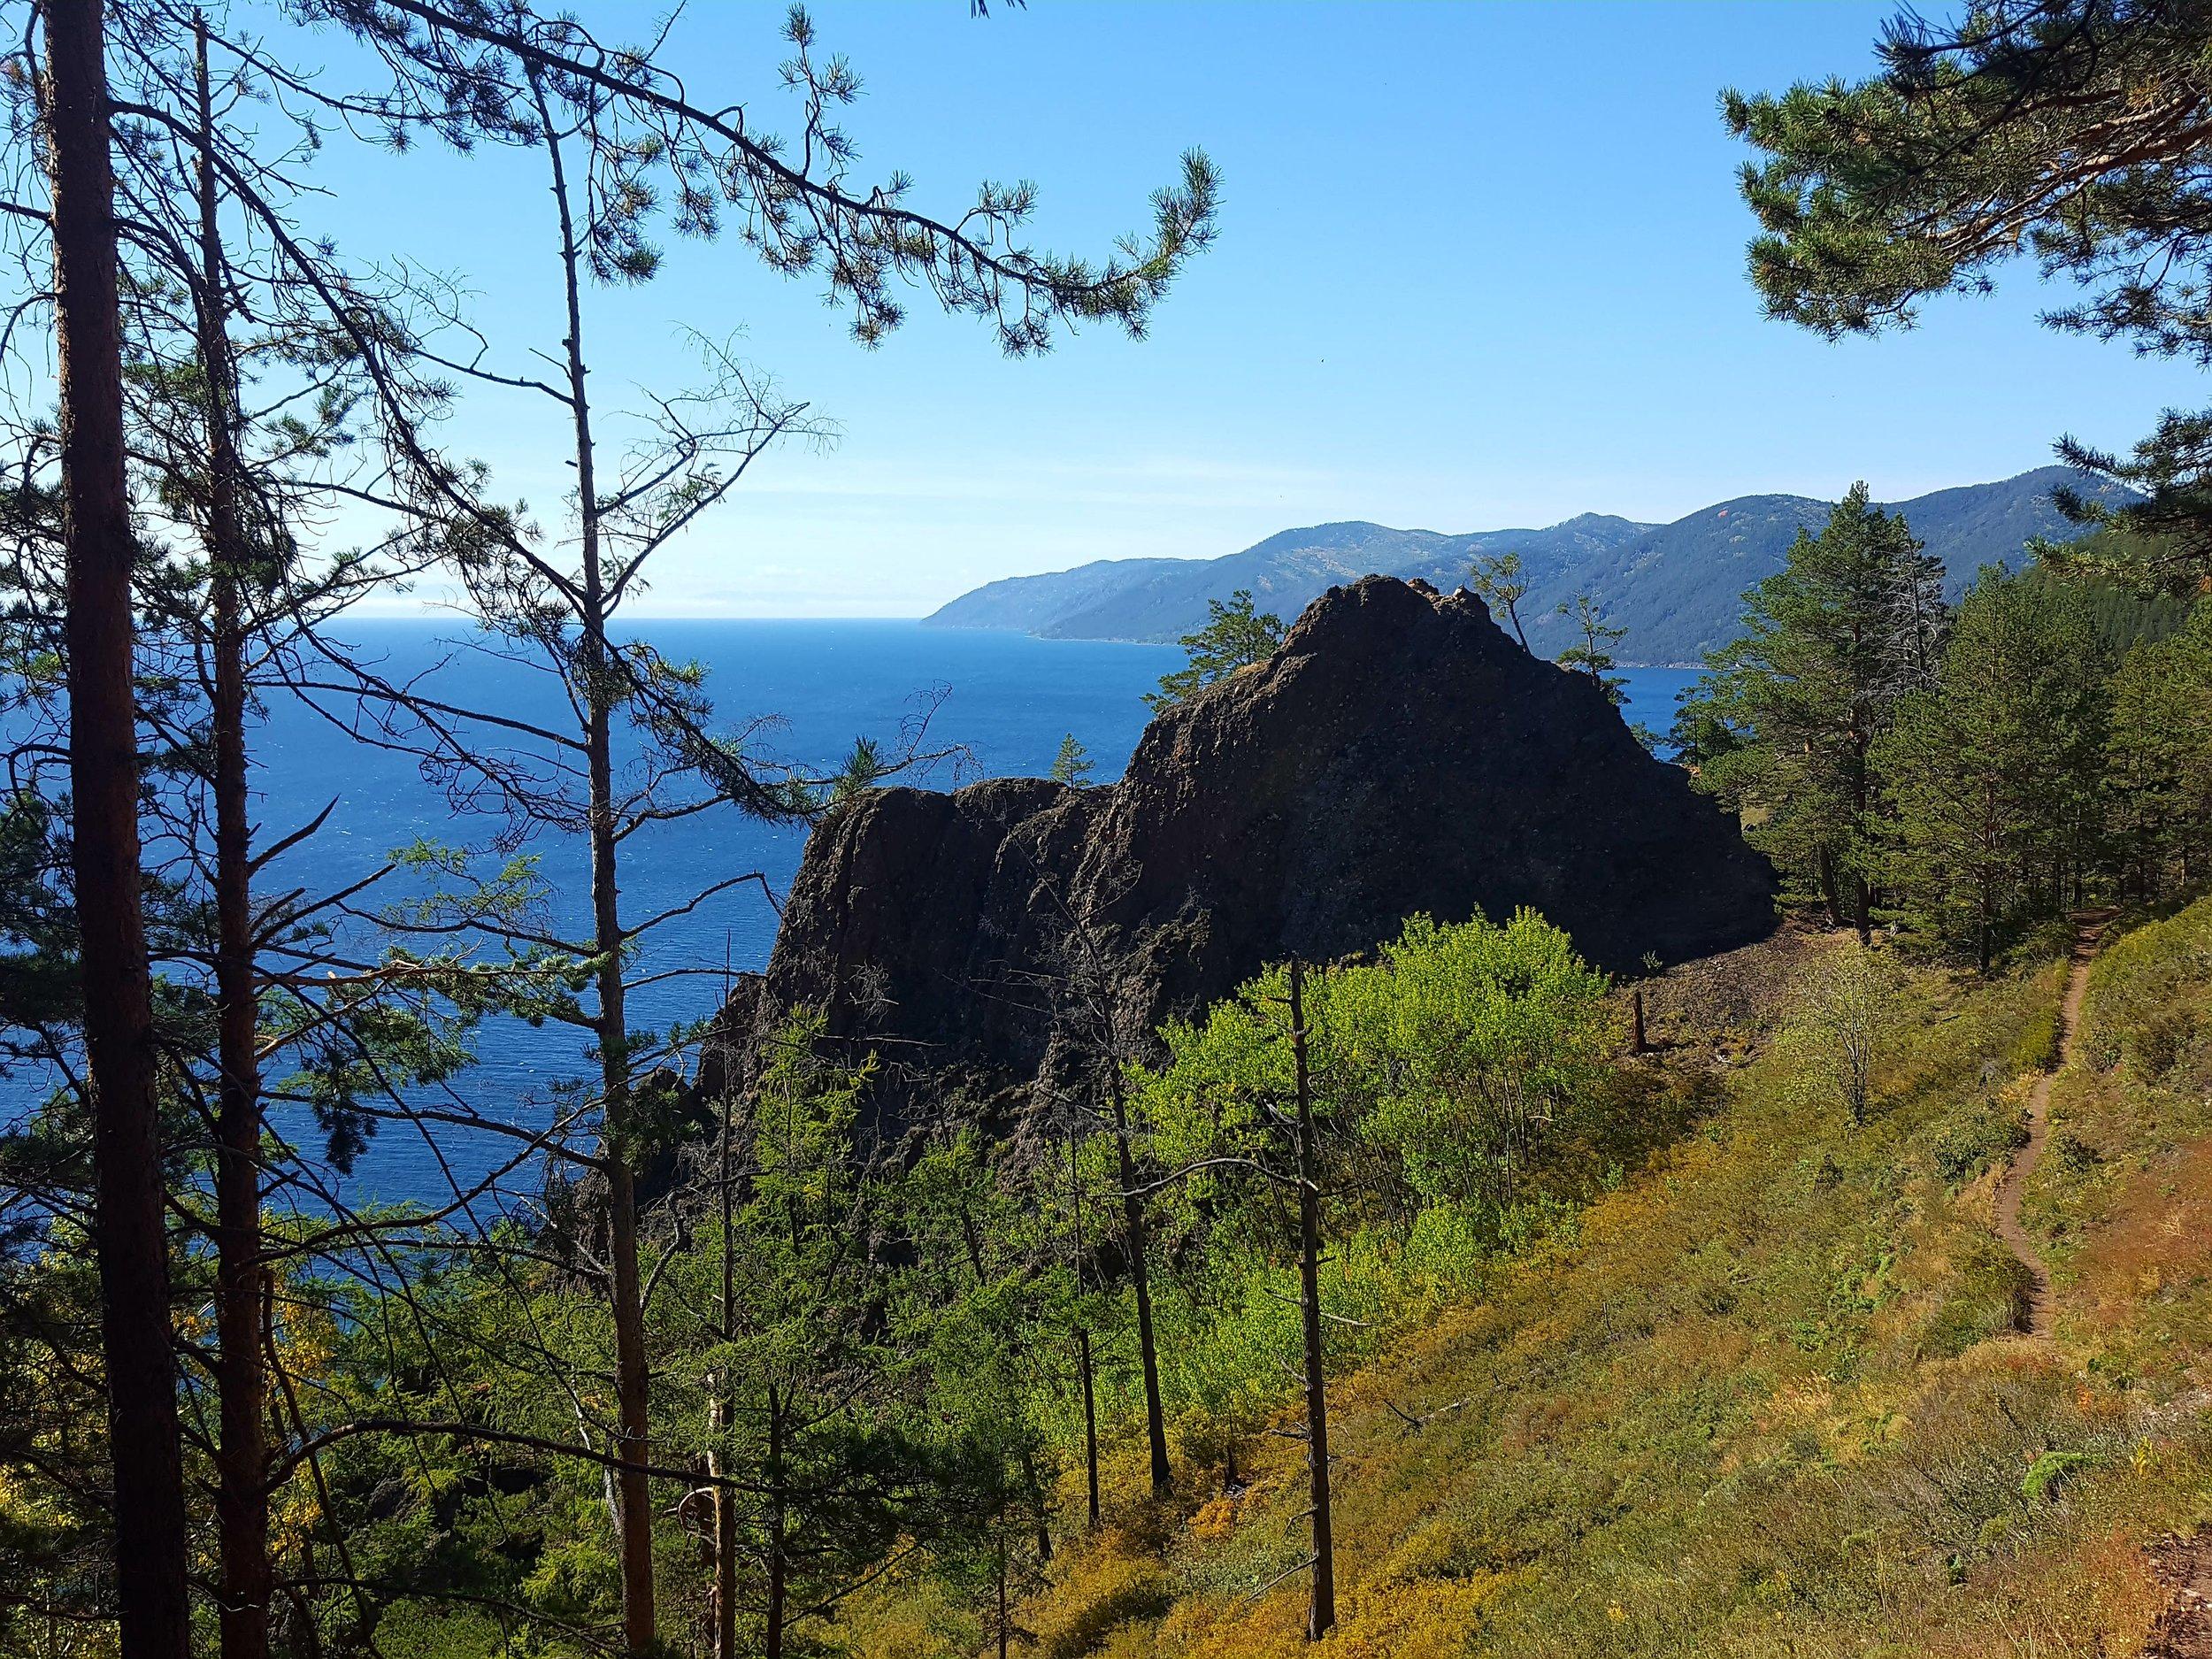 Fotos_WEbsite_Baikalsee (11).jpg